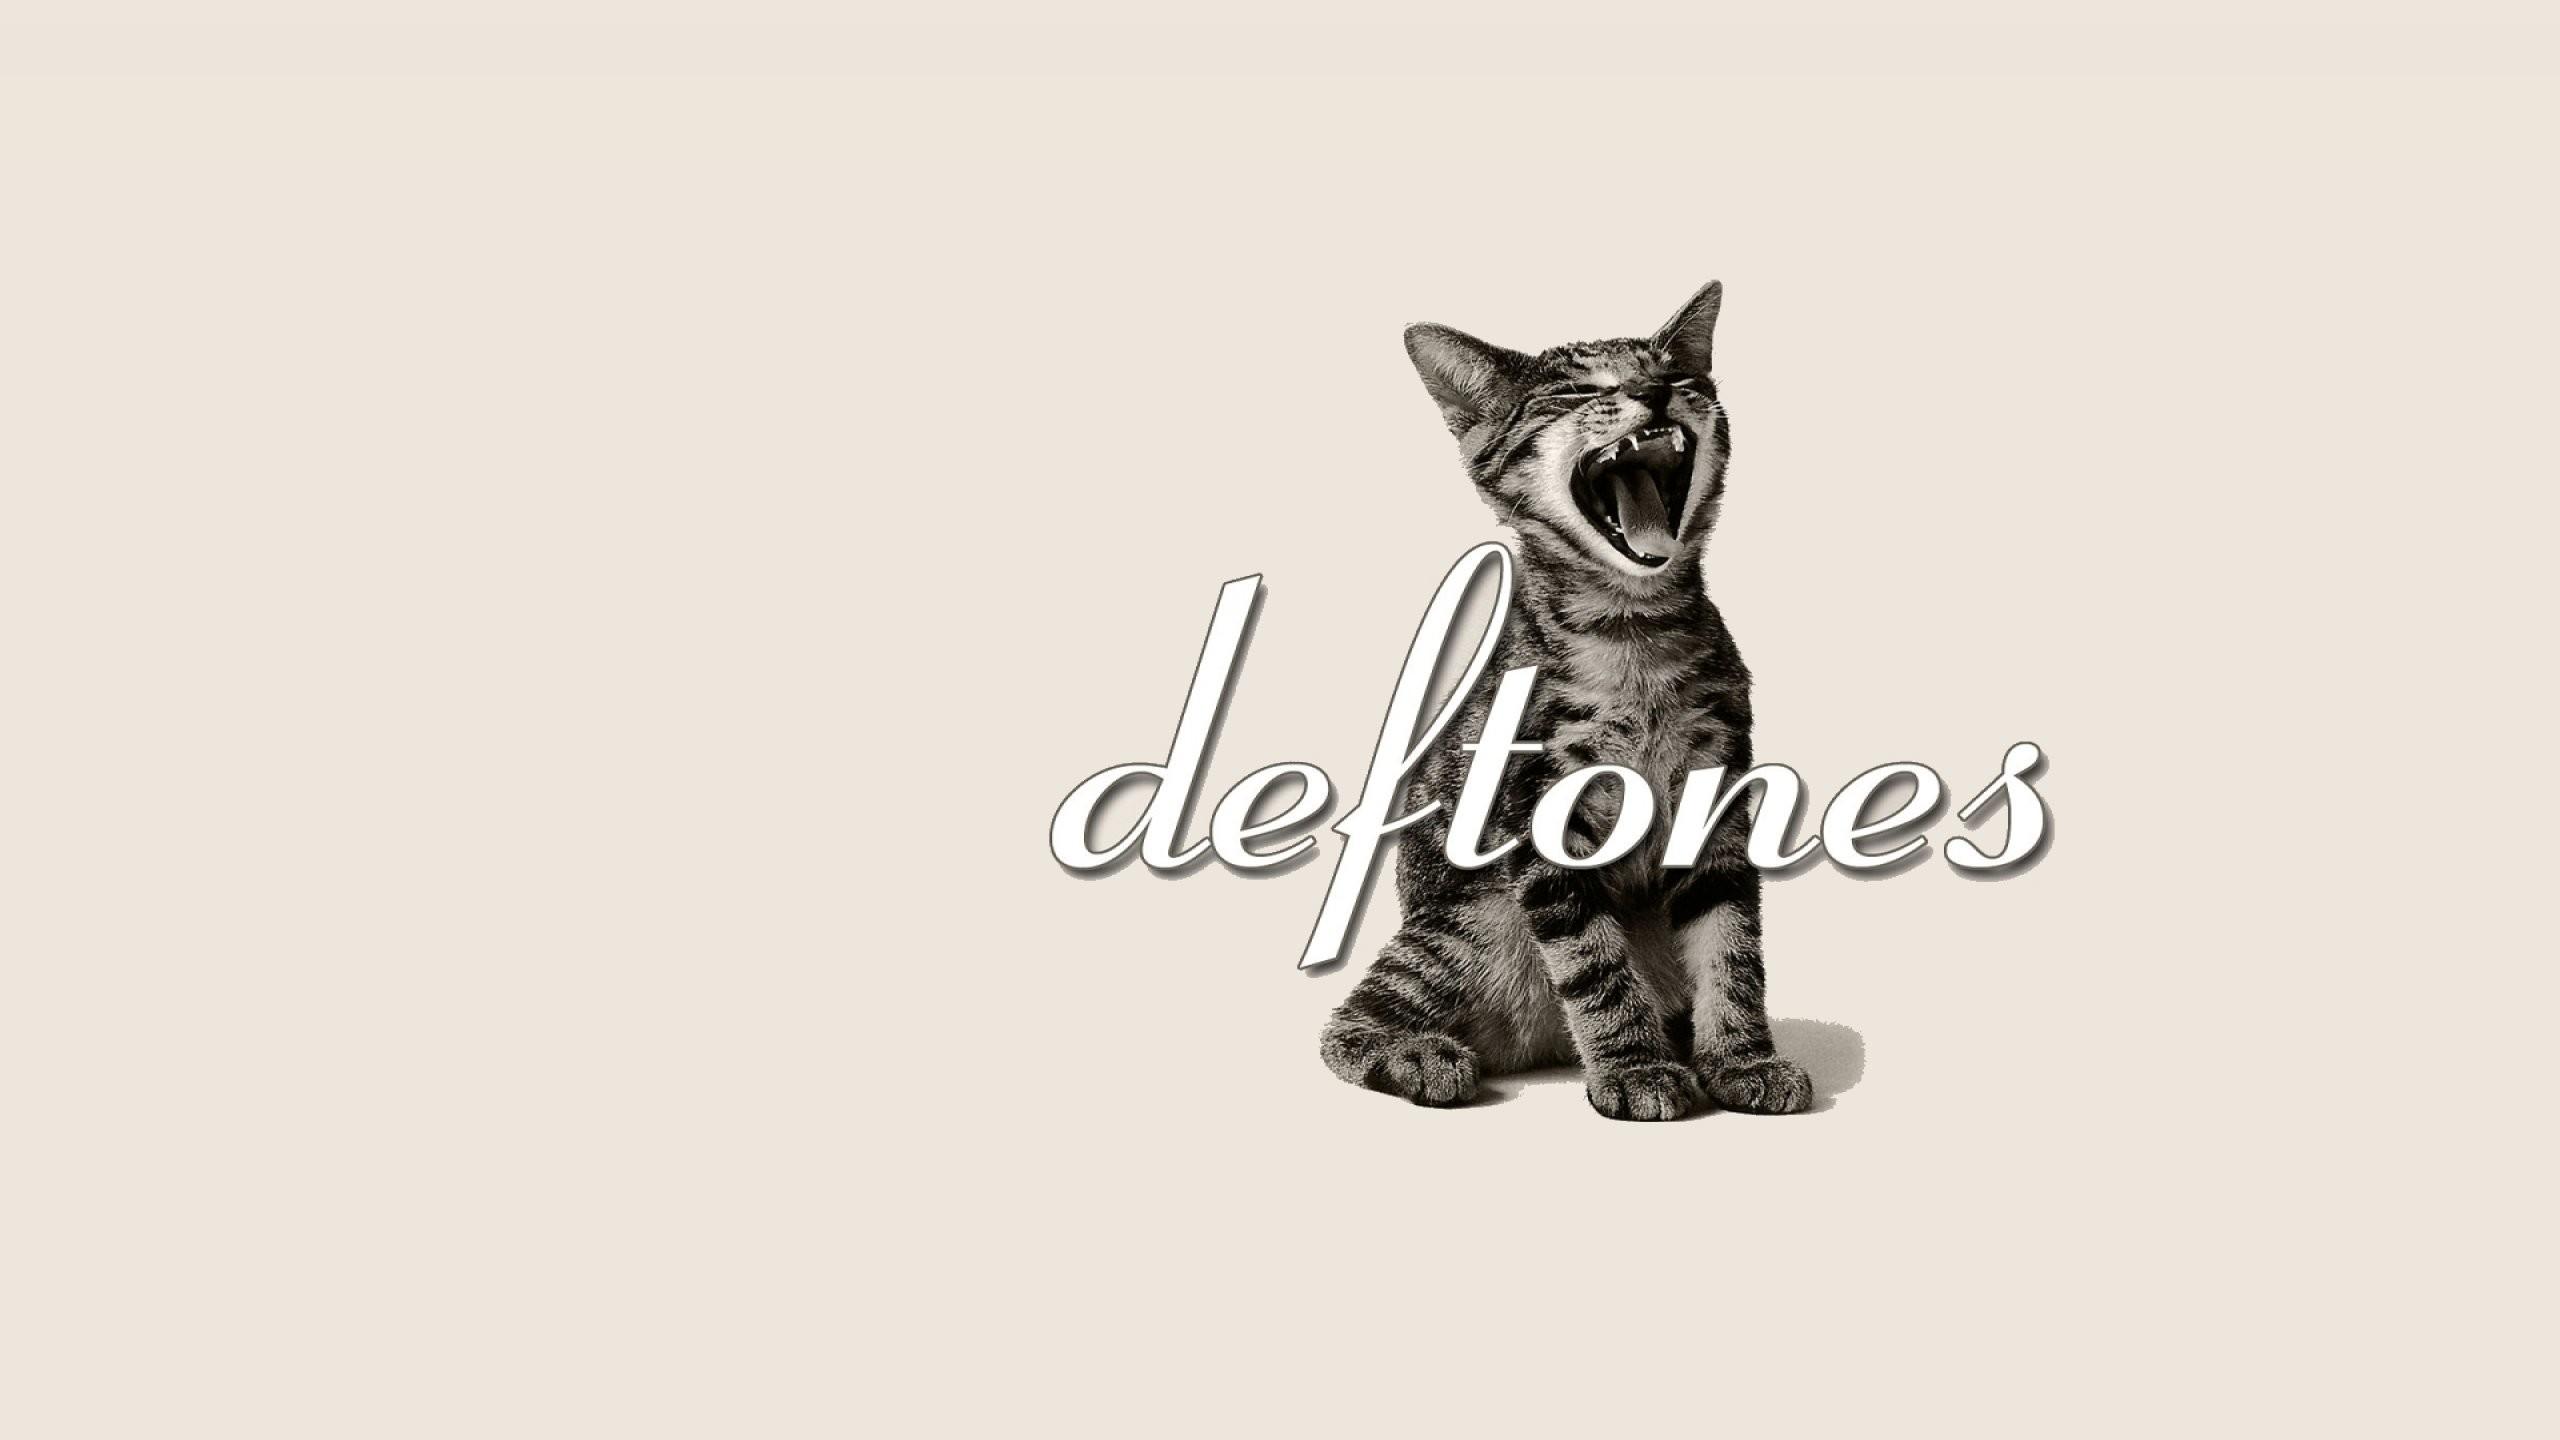 Res: 2560x1440, DEFTONES alternative metal experimental rock nu-metal heavy hard cat kitten  wallpaper      549677   WallpaperUP